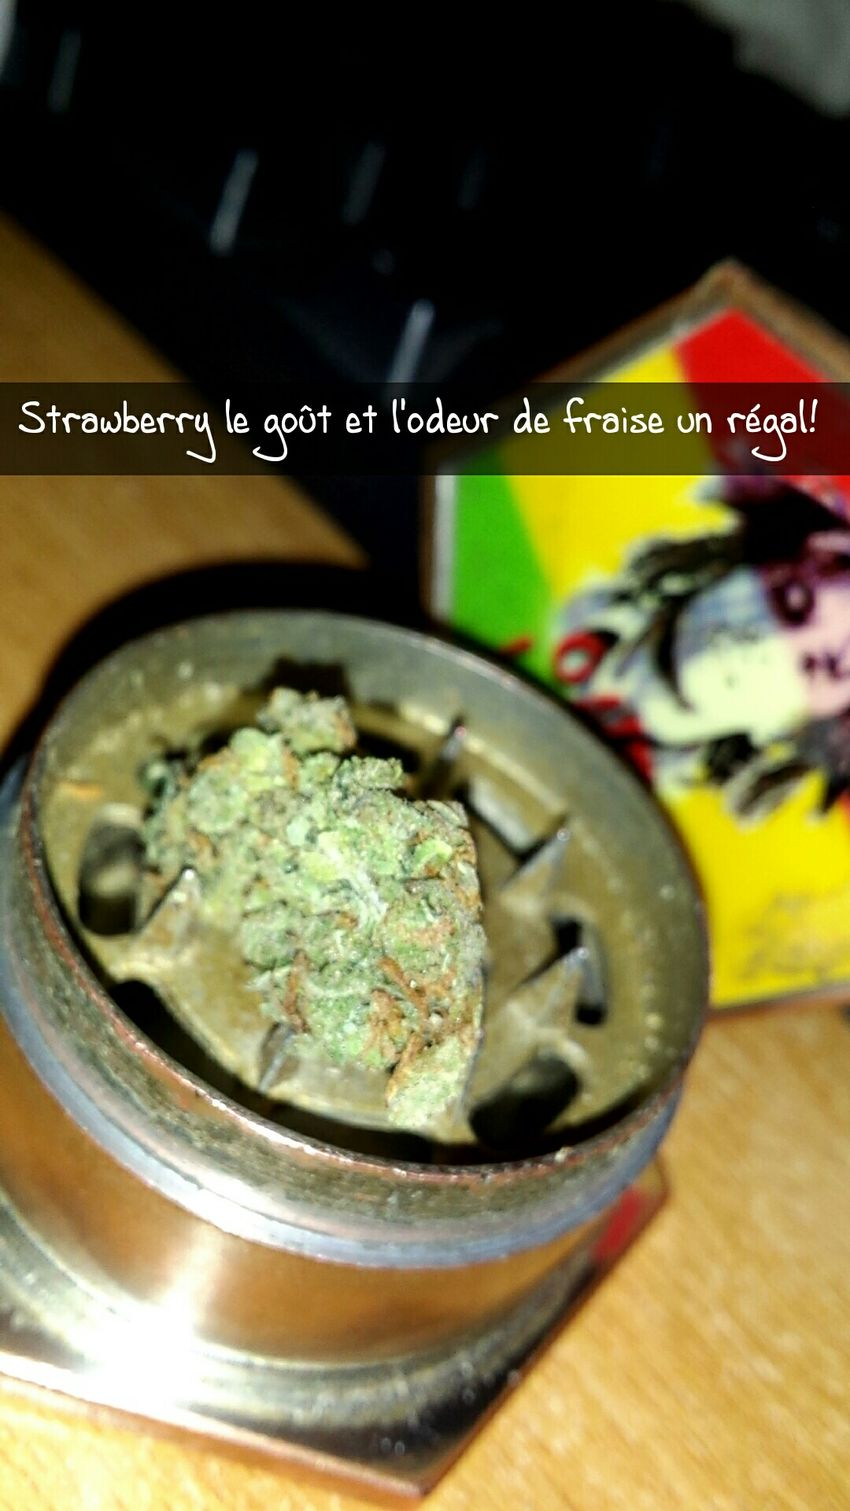 Frenchcloutboyz Smoking Weed Smokeweedeveryday Snapchat Moici Bang Bang Weed Life Strawberry Haze  Strawberry Oklm Elle sort du fraisier mais reste déconseillé au femme enceinte ! ☺